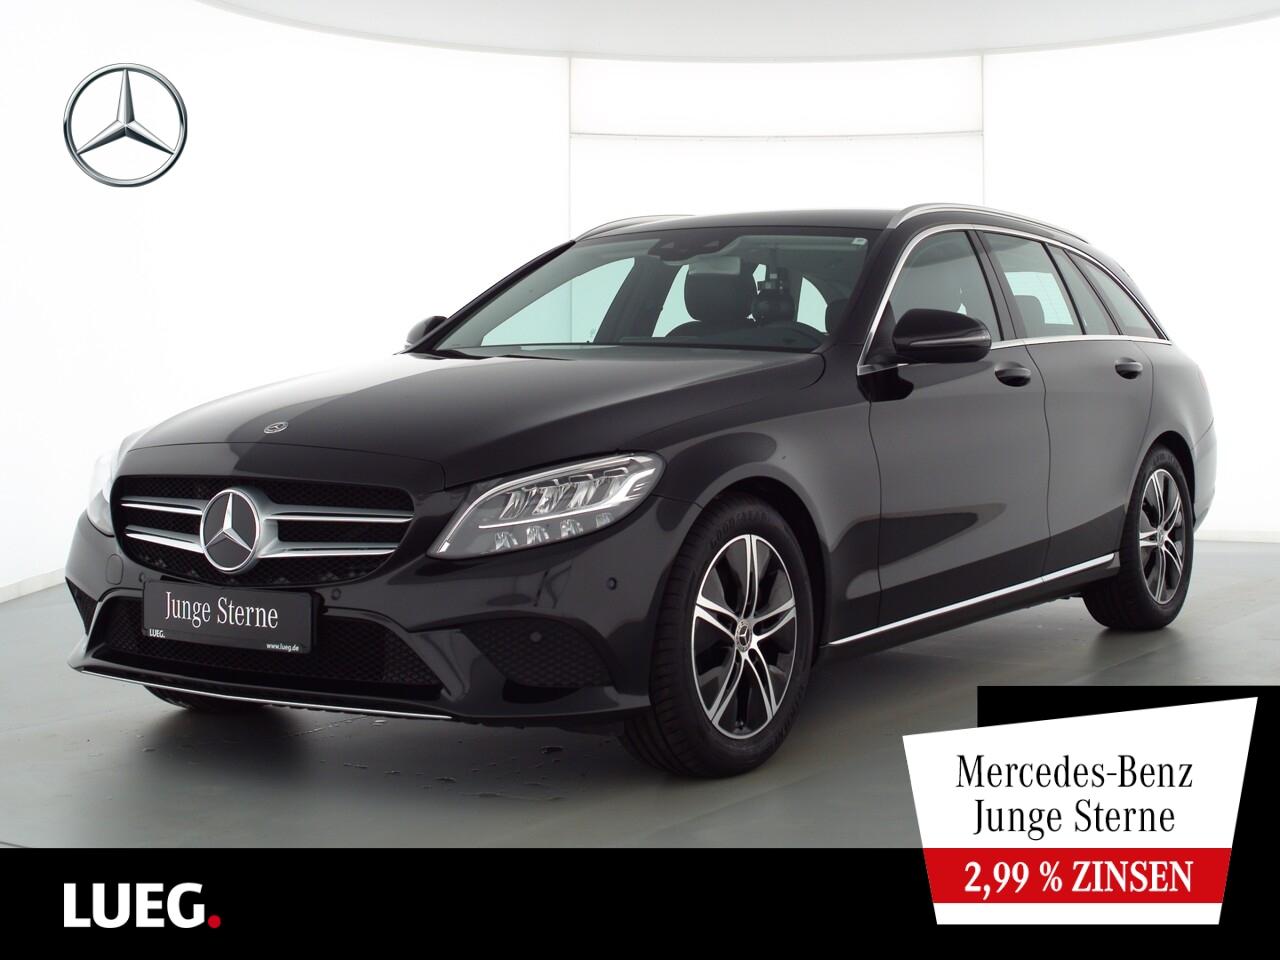 Mercedes-Benz C 220 d T Avantgarde+Navi+LED-HP+AHK+SpurPkt+RFK, Jahr 2020, Diesel